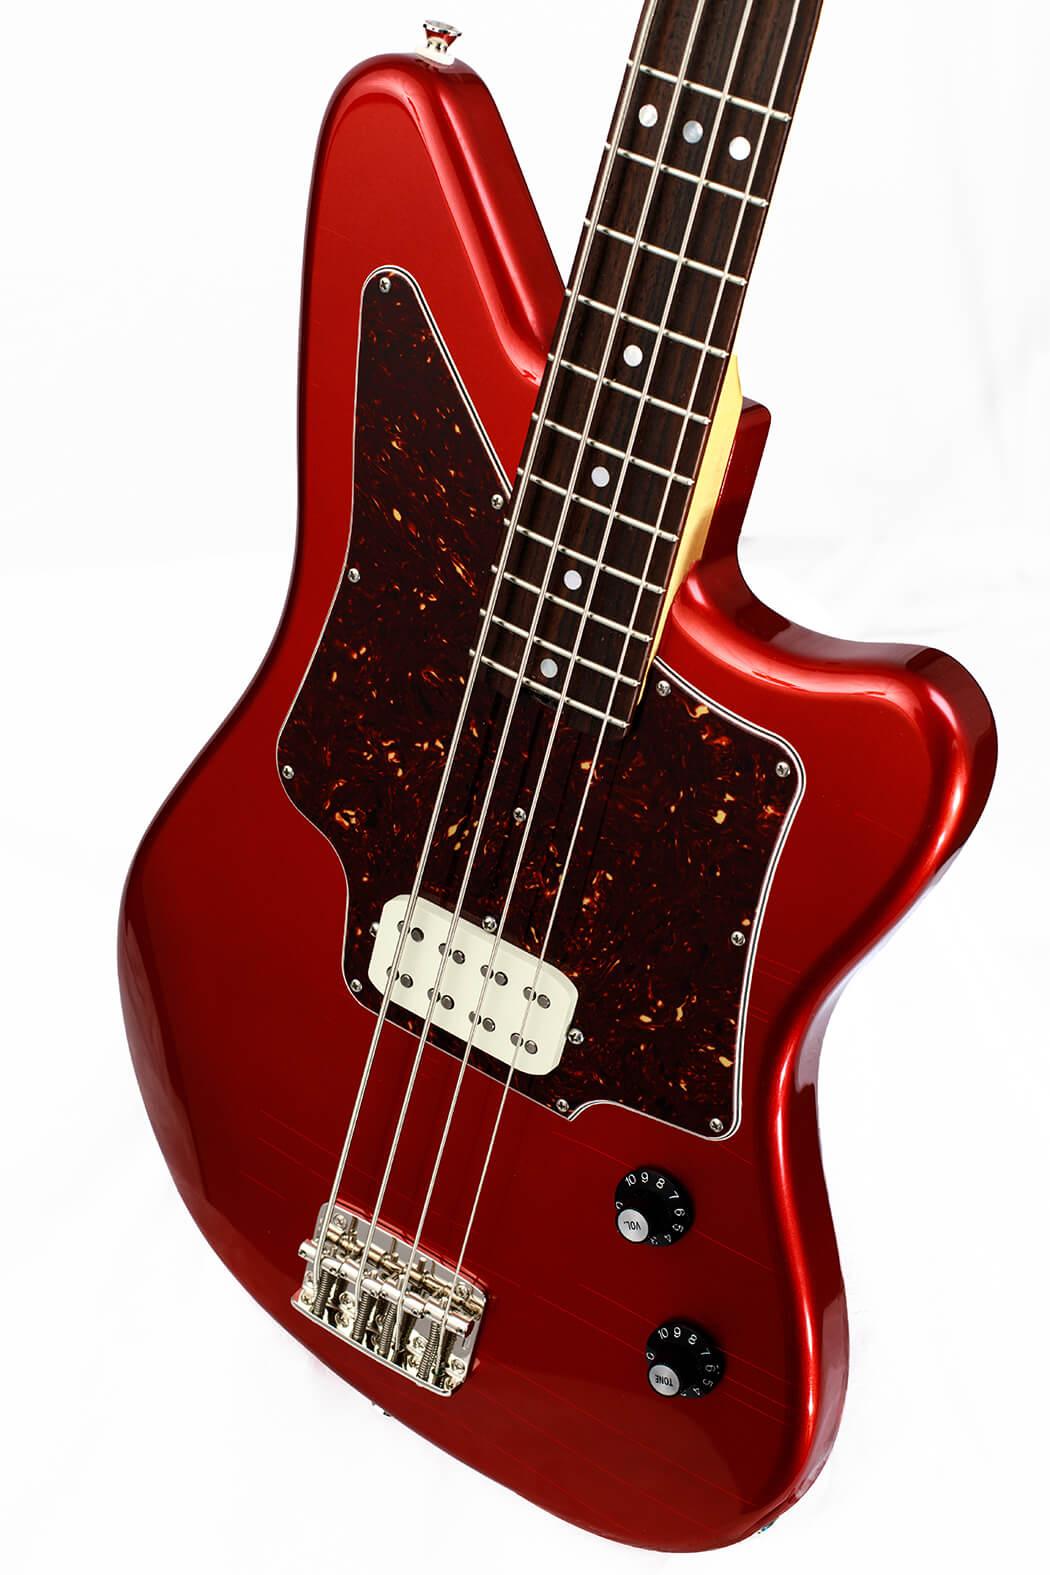 Swope Bass